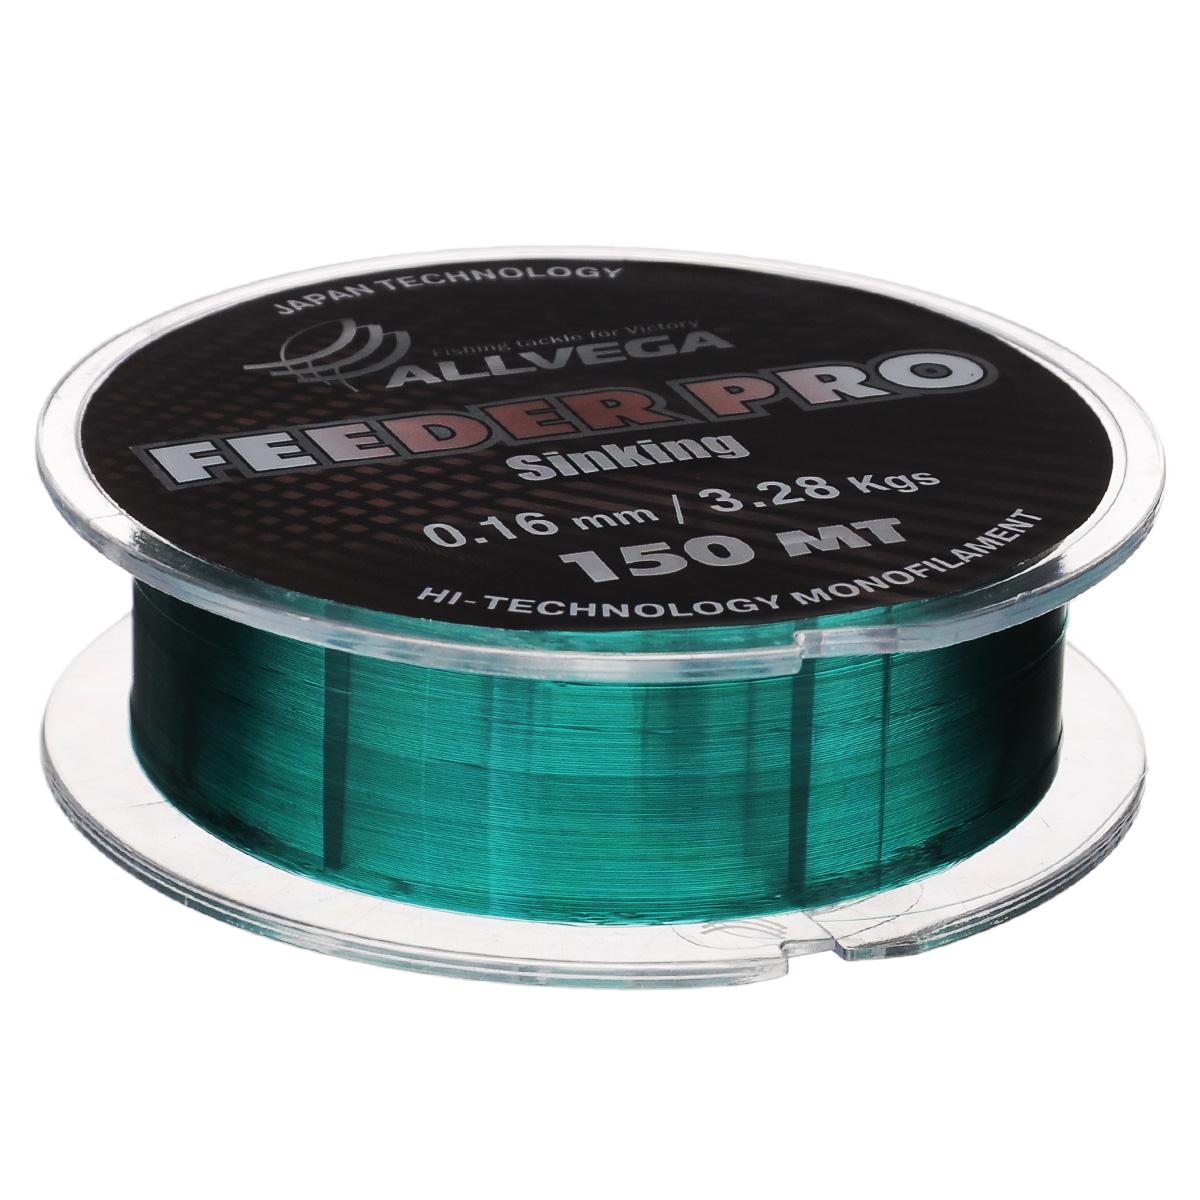 Леска Allvega Feeder Pro Sinking, цвет: темно-зеленый, 150 м, 0,16 мм, 3,28 кг